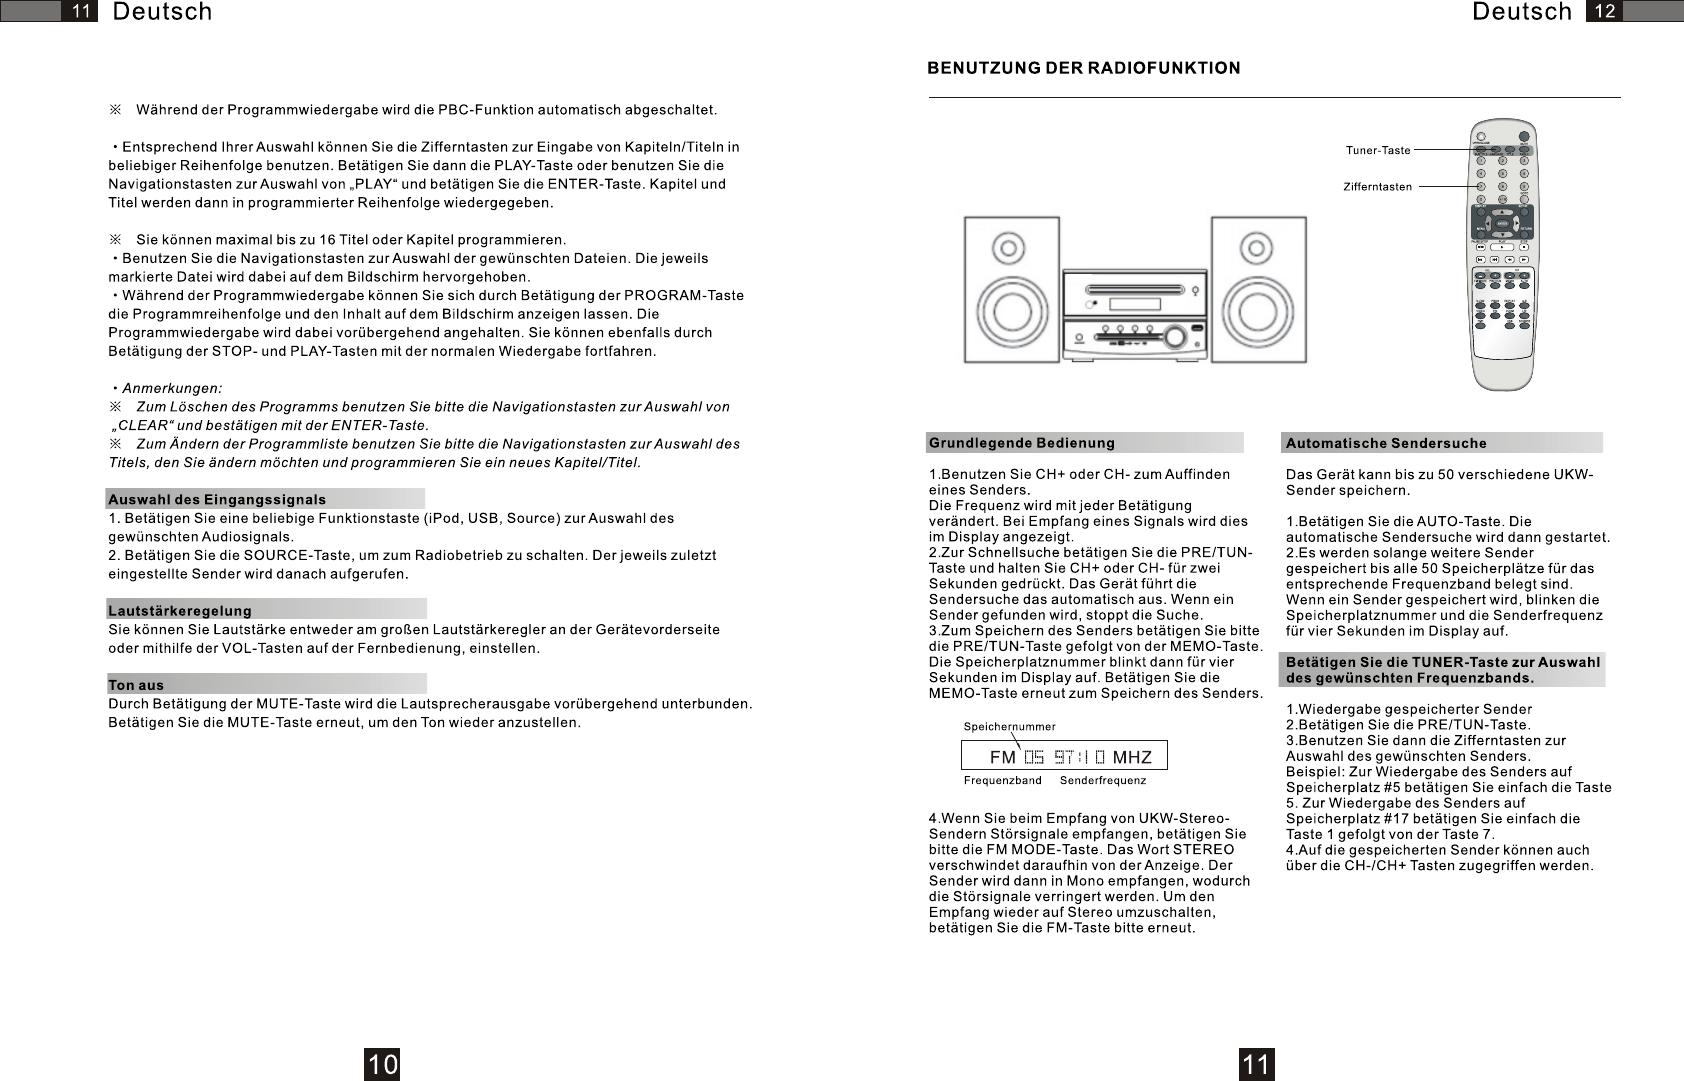 Manual AEG MC 4426 DVD (page 10 of 12) (German)